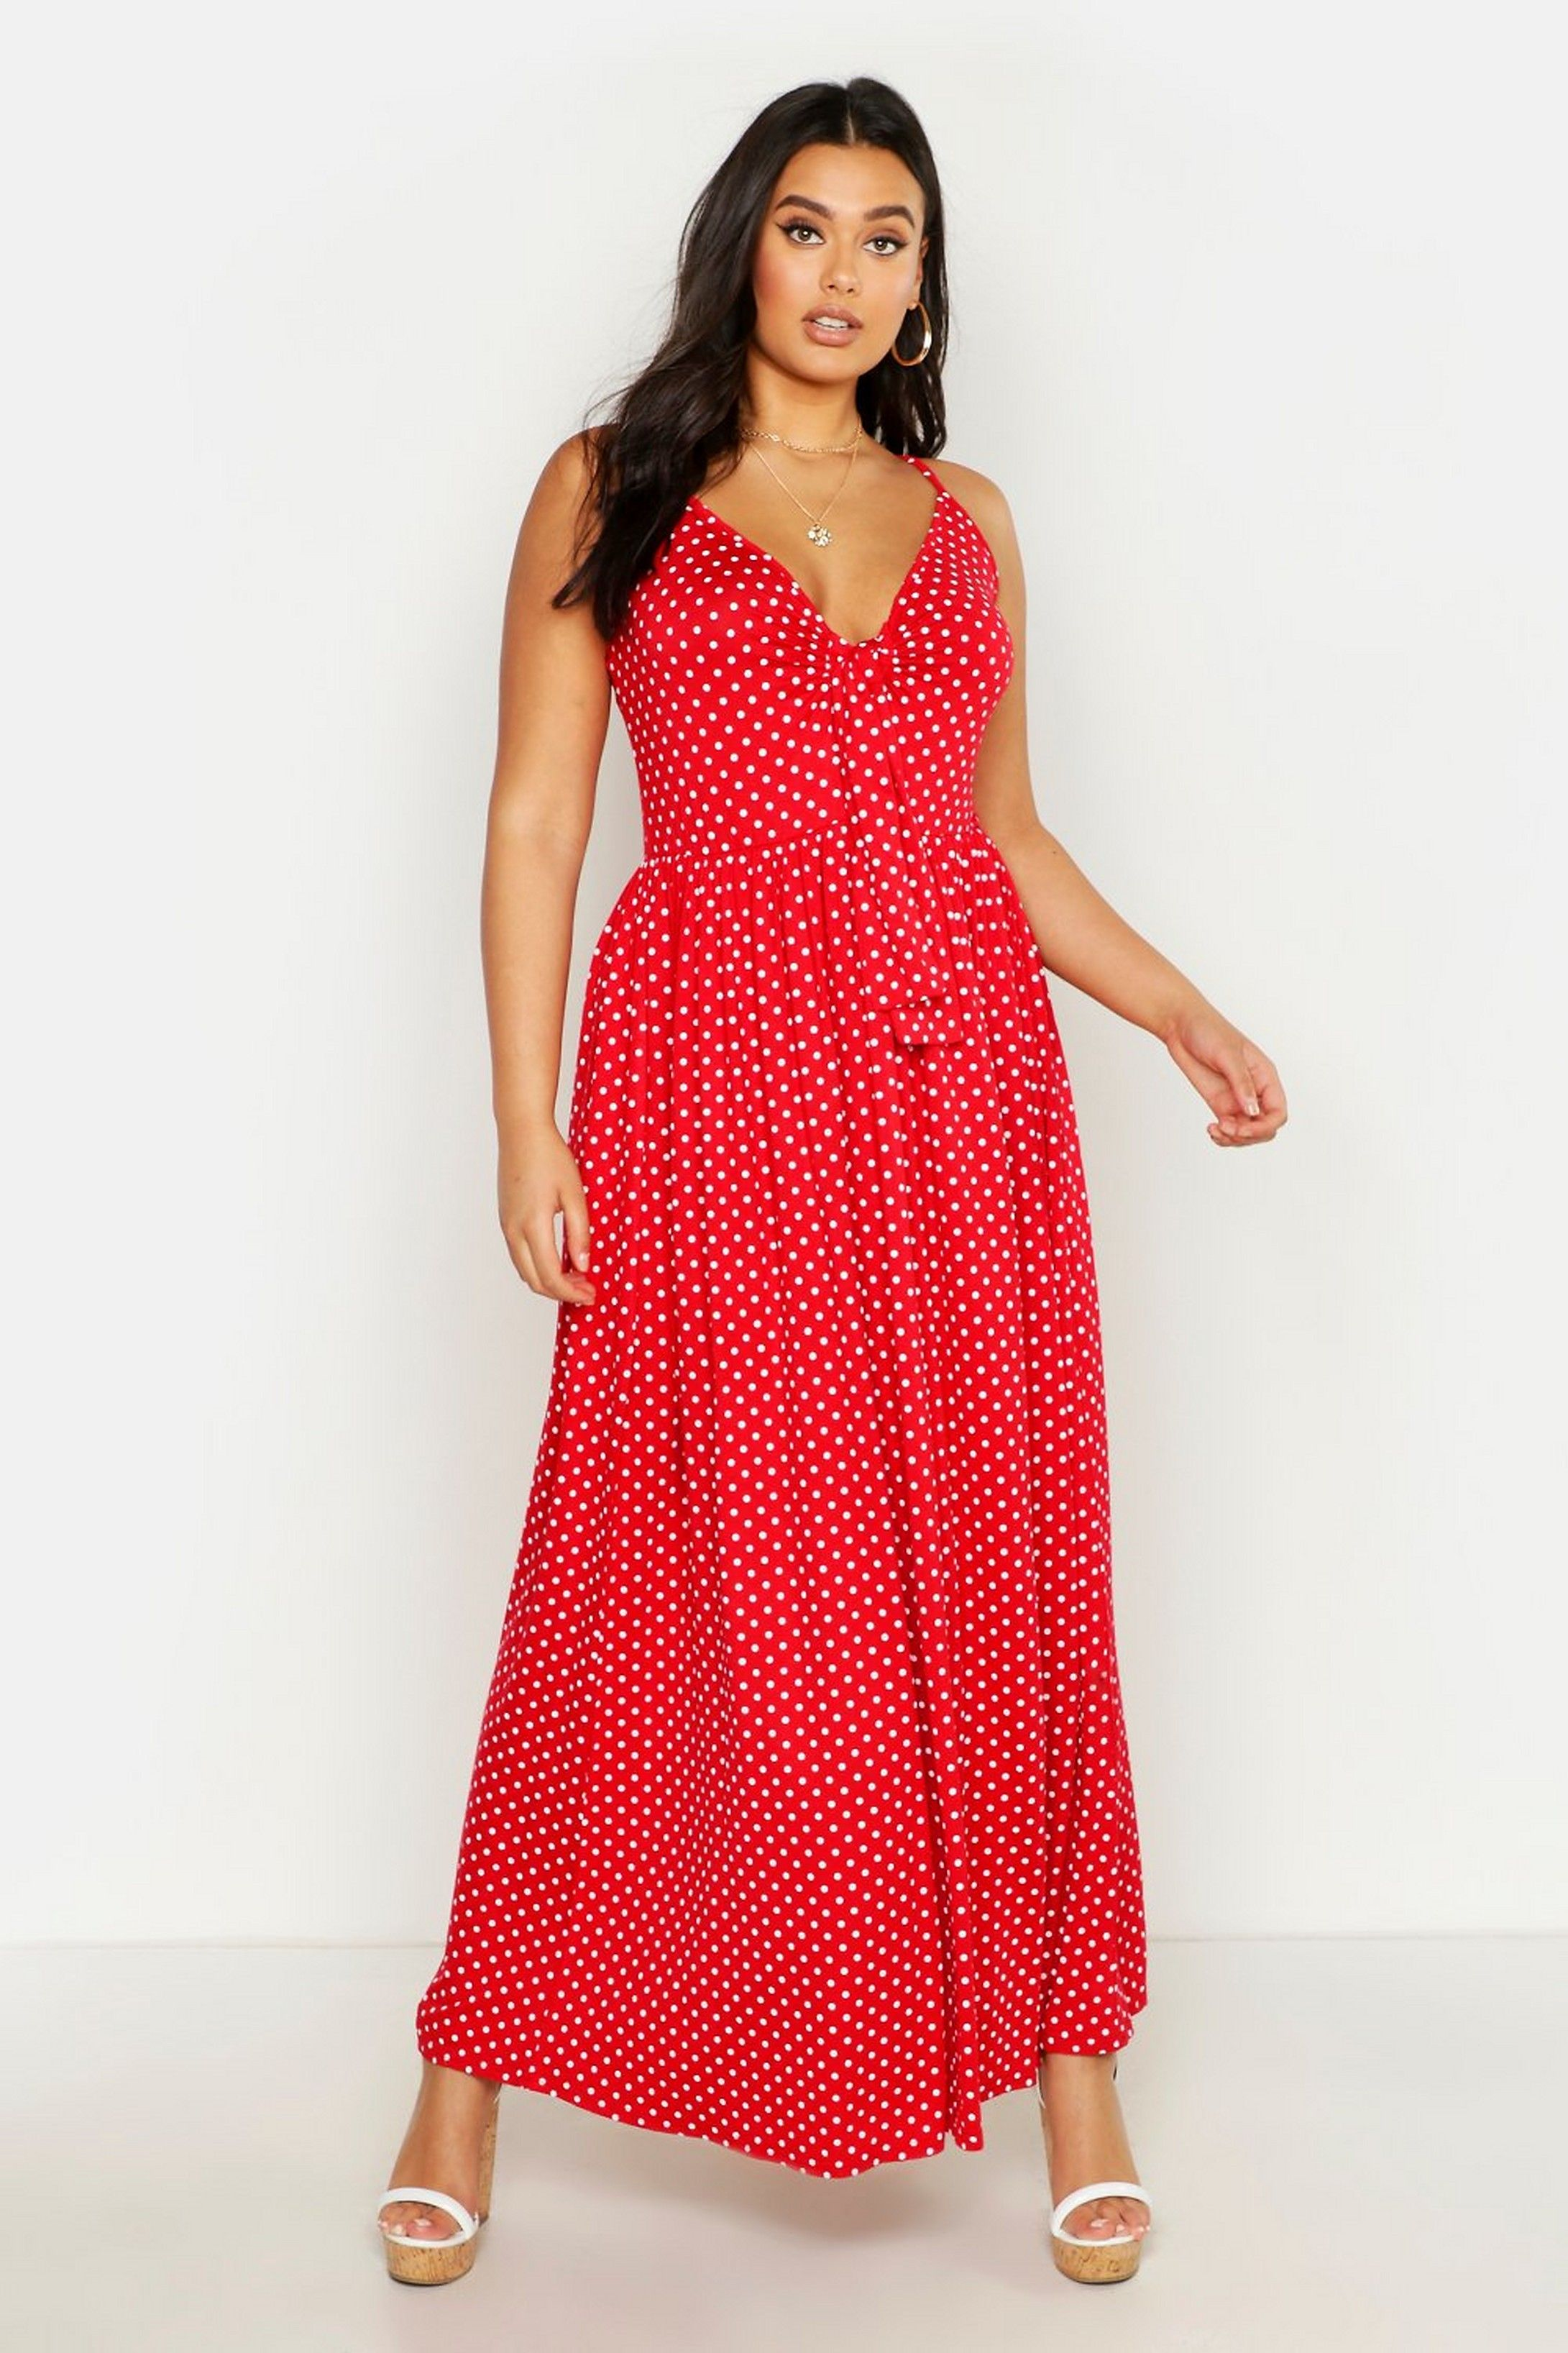 Plus Polka Dot Strappy Knot Front Maxi Dress Boohoo Maxi Dress Plus Size Maxi Dresses Maxi Dress Designs [ 3272 x 2181 Pixel ]